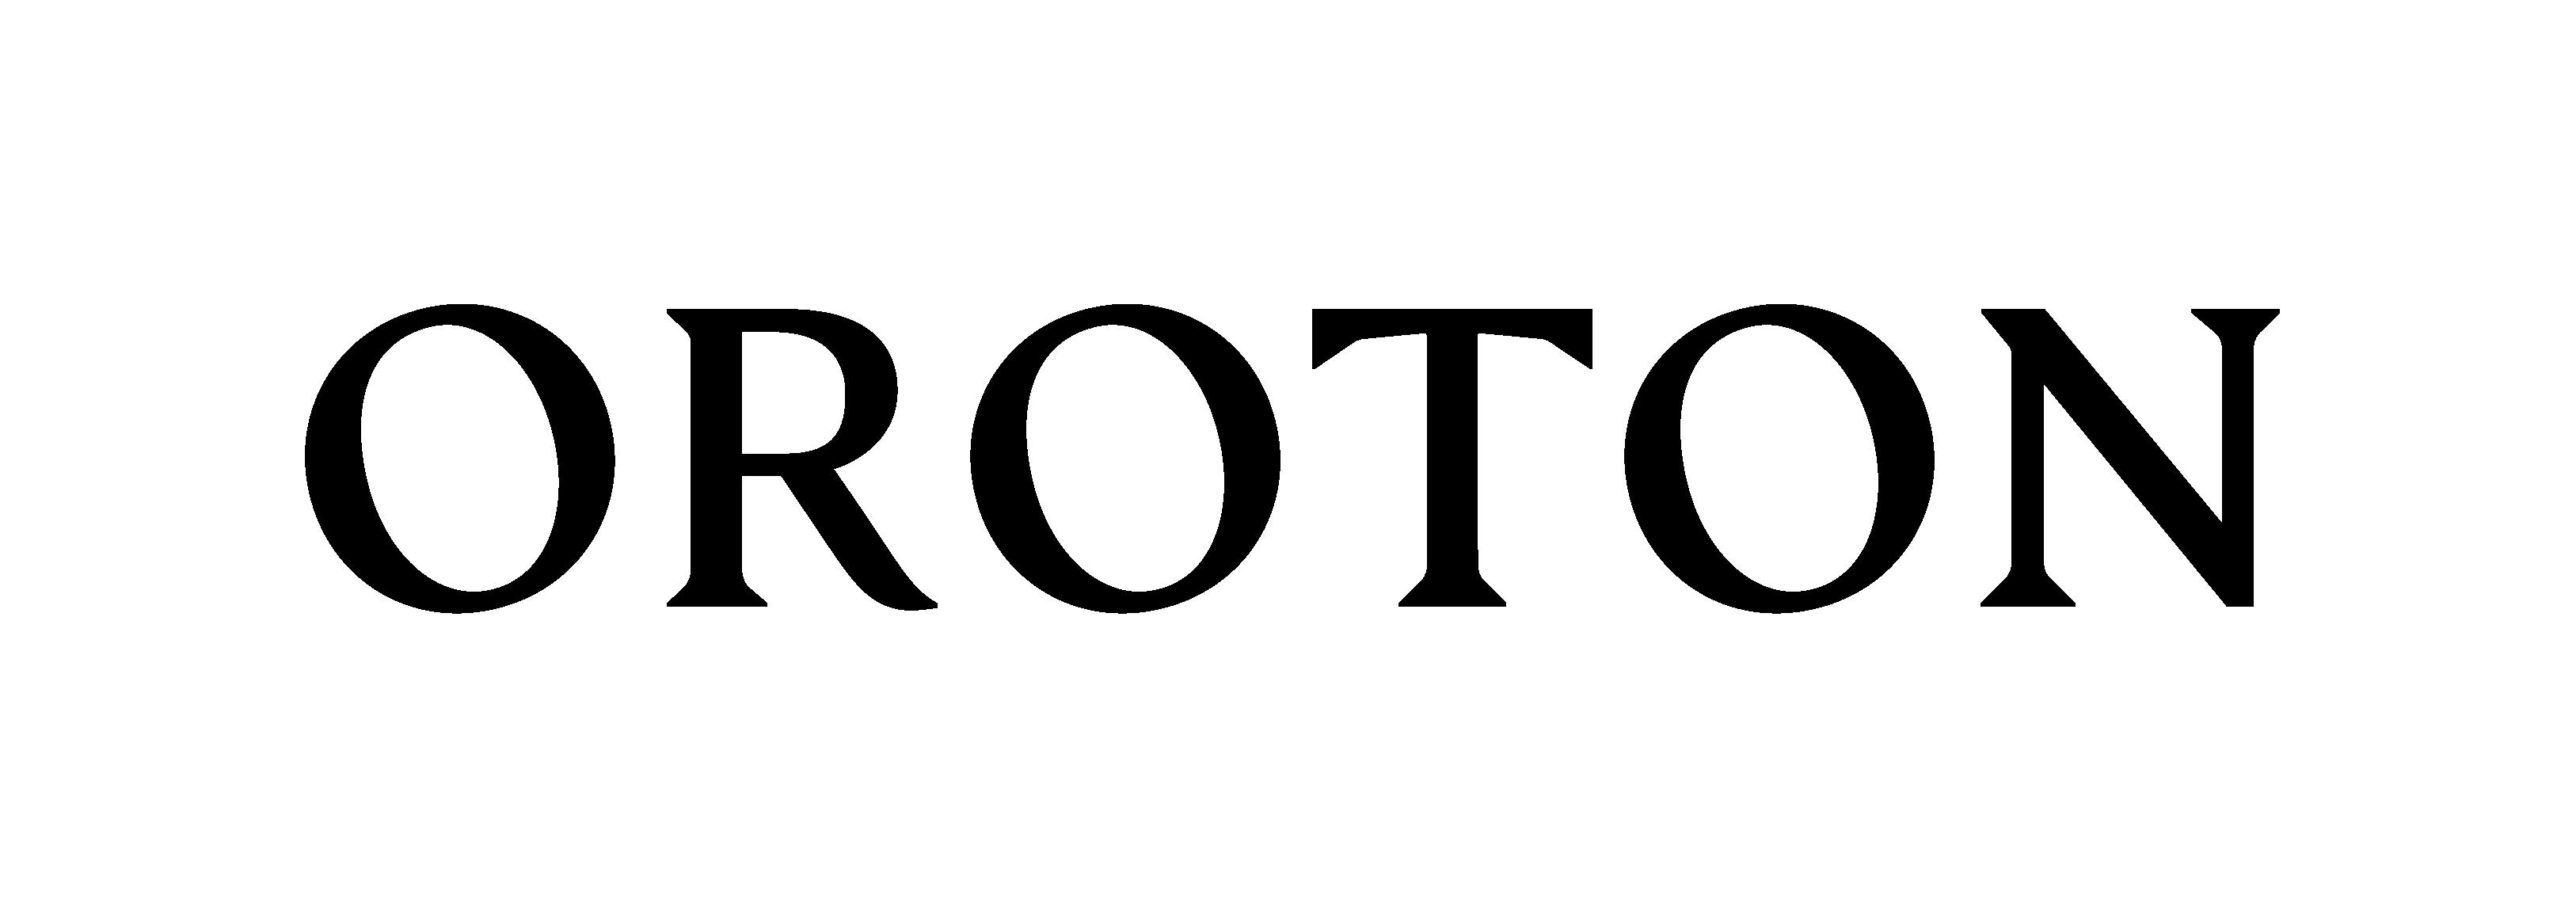 oro638_logotype_fa_black